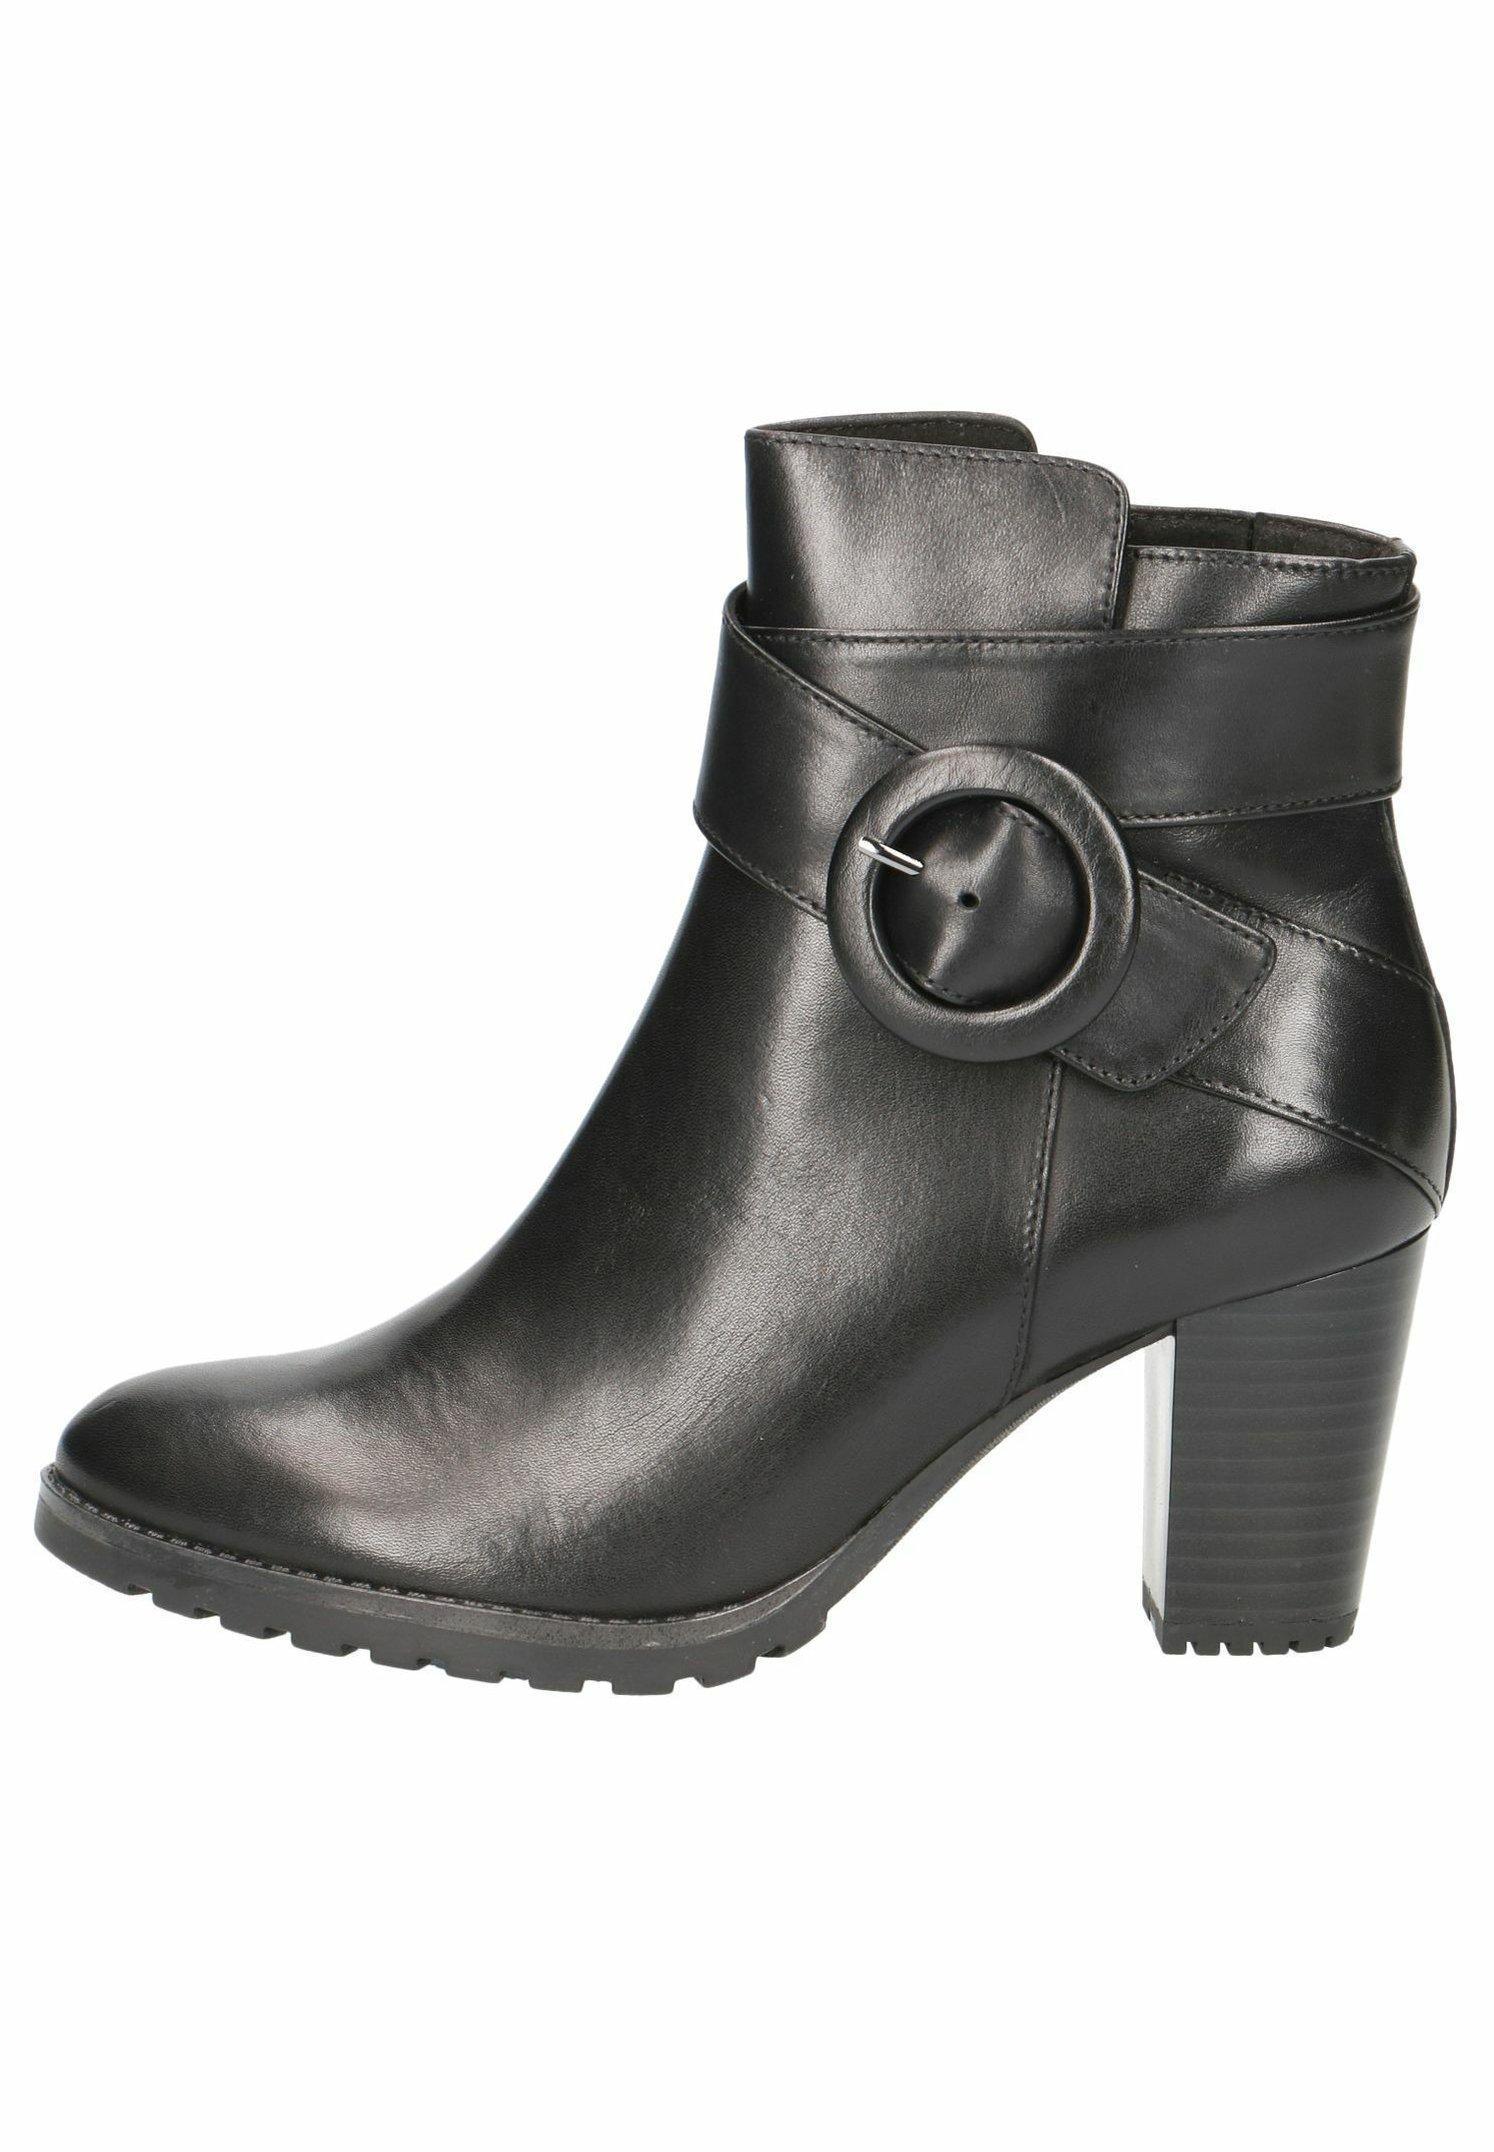 Damen STIEFELETTE - Ankle Boot